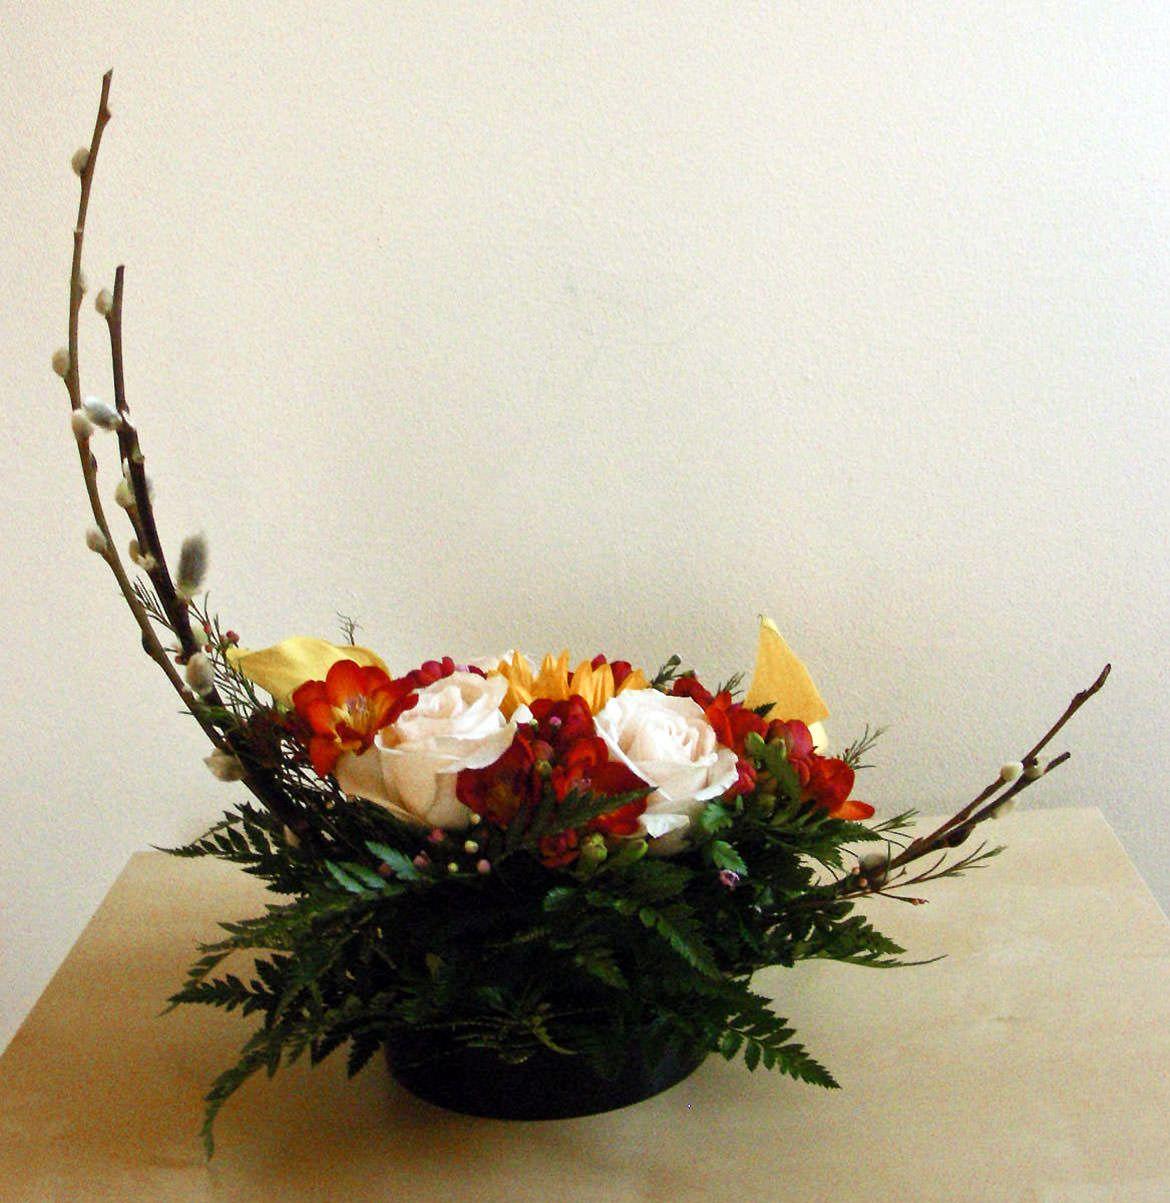 Crescent Flower Arrangements Designs Crescent Flower Arrangement